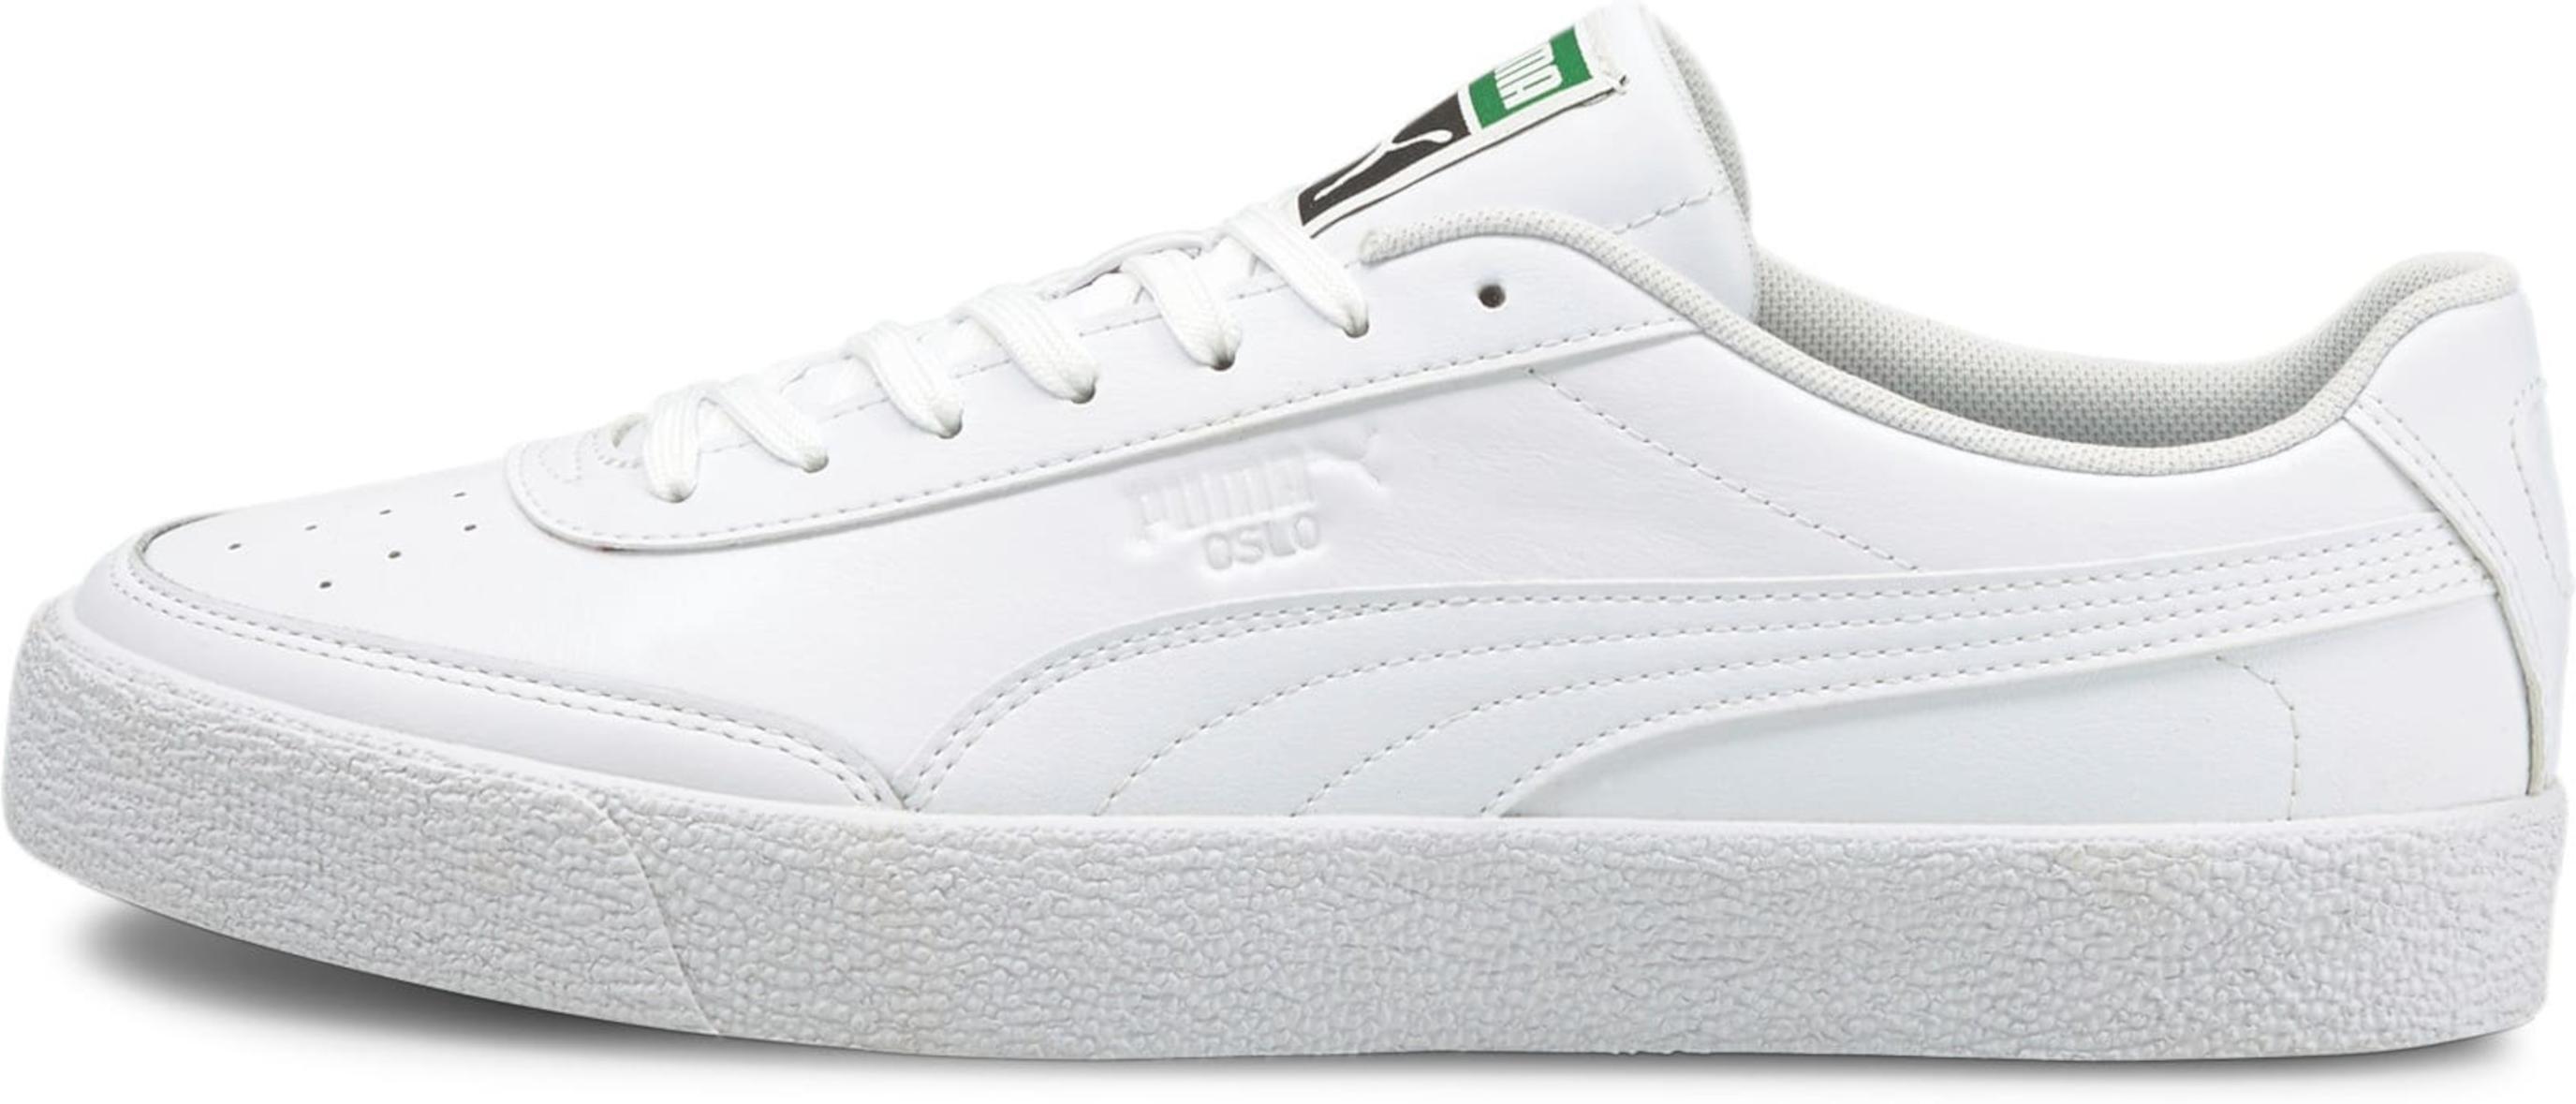 Shoes Puma Oslo Vulc M - Top4Running.com